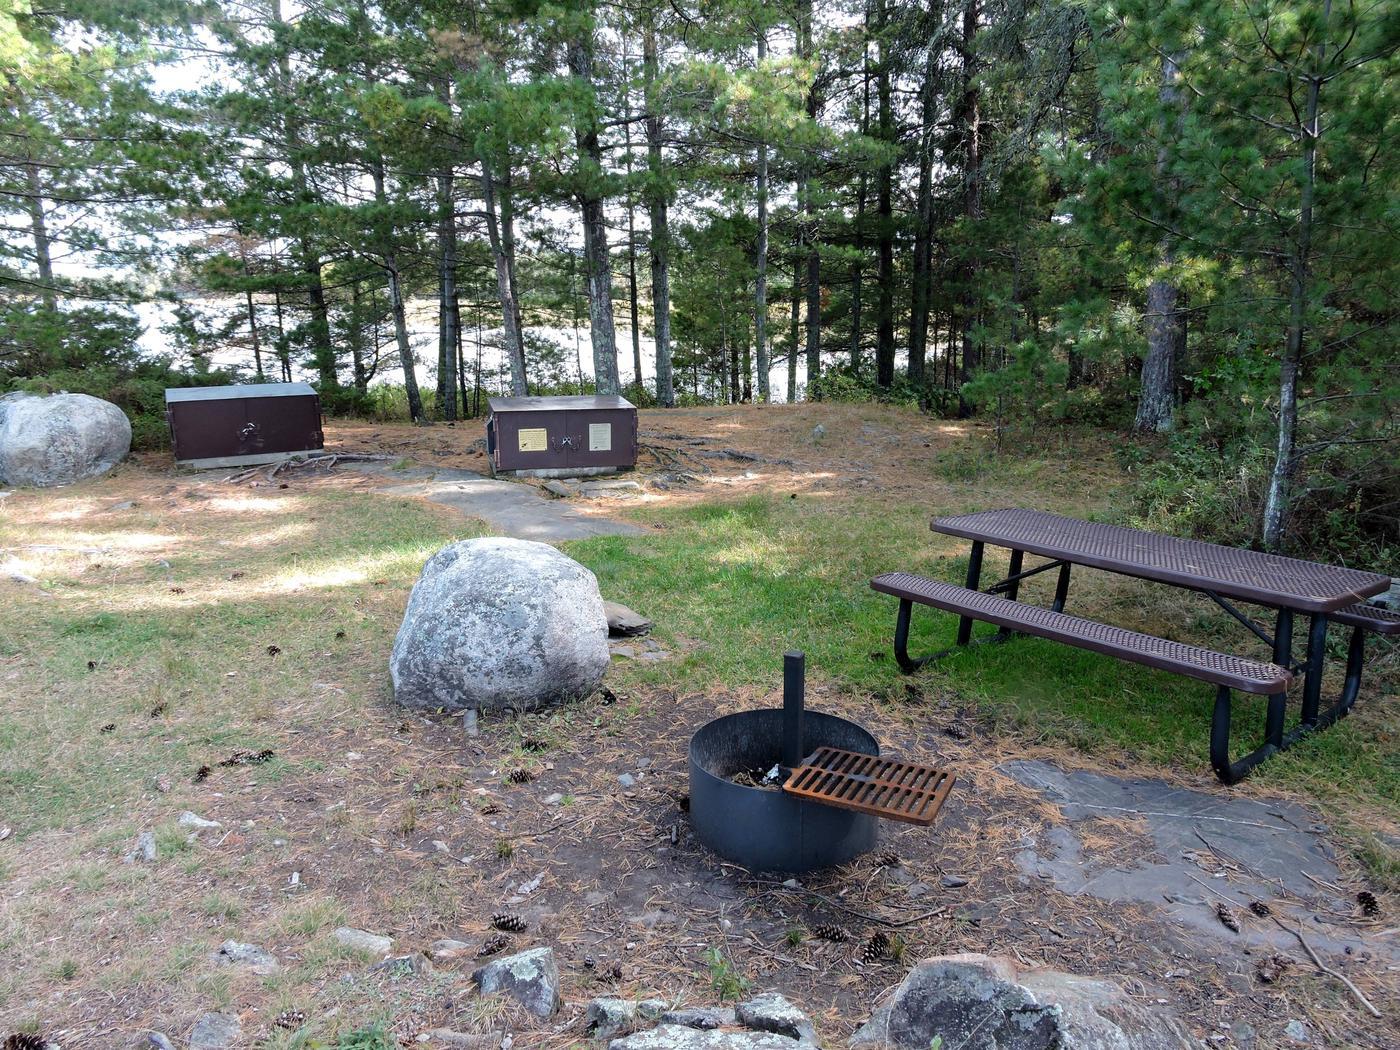 R1 - Alder CreekView of campsite